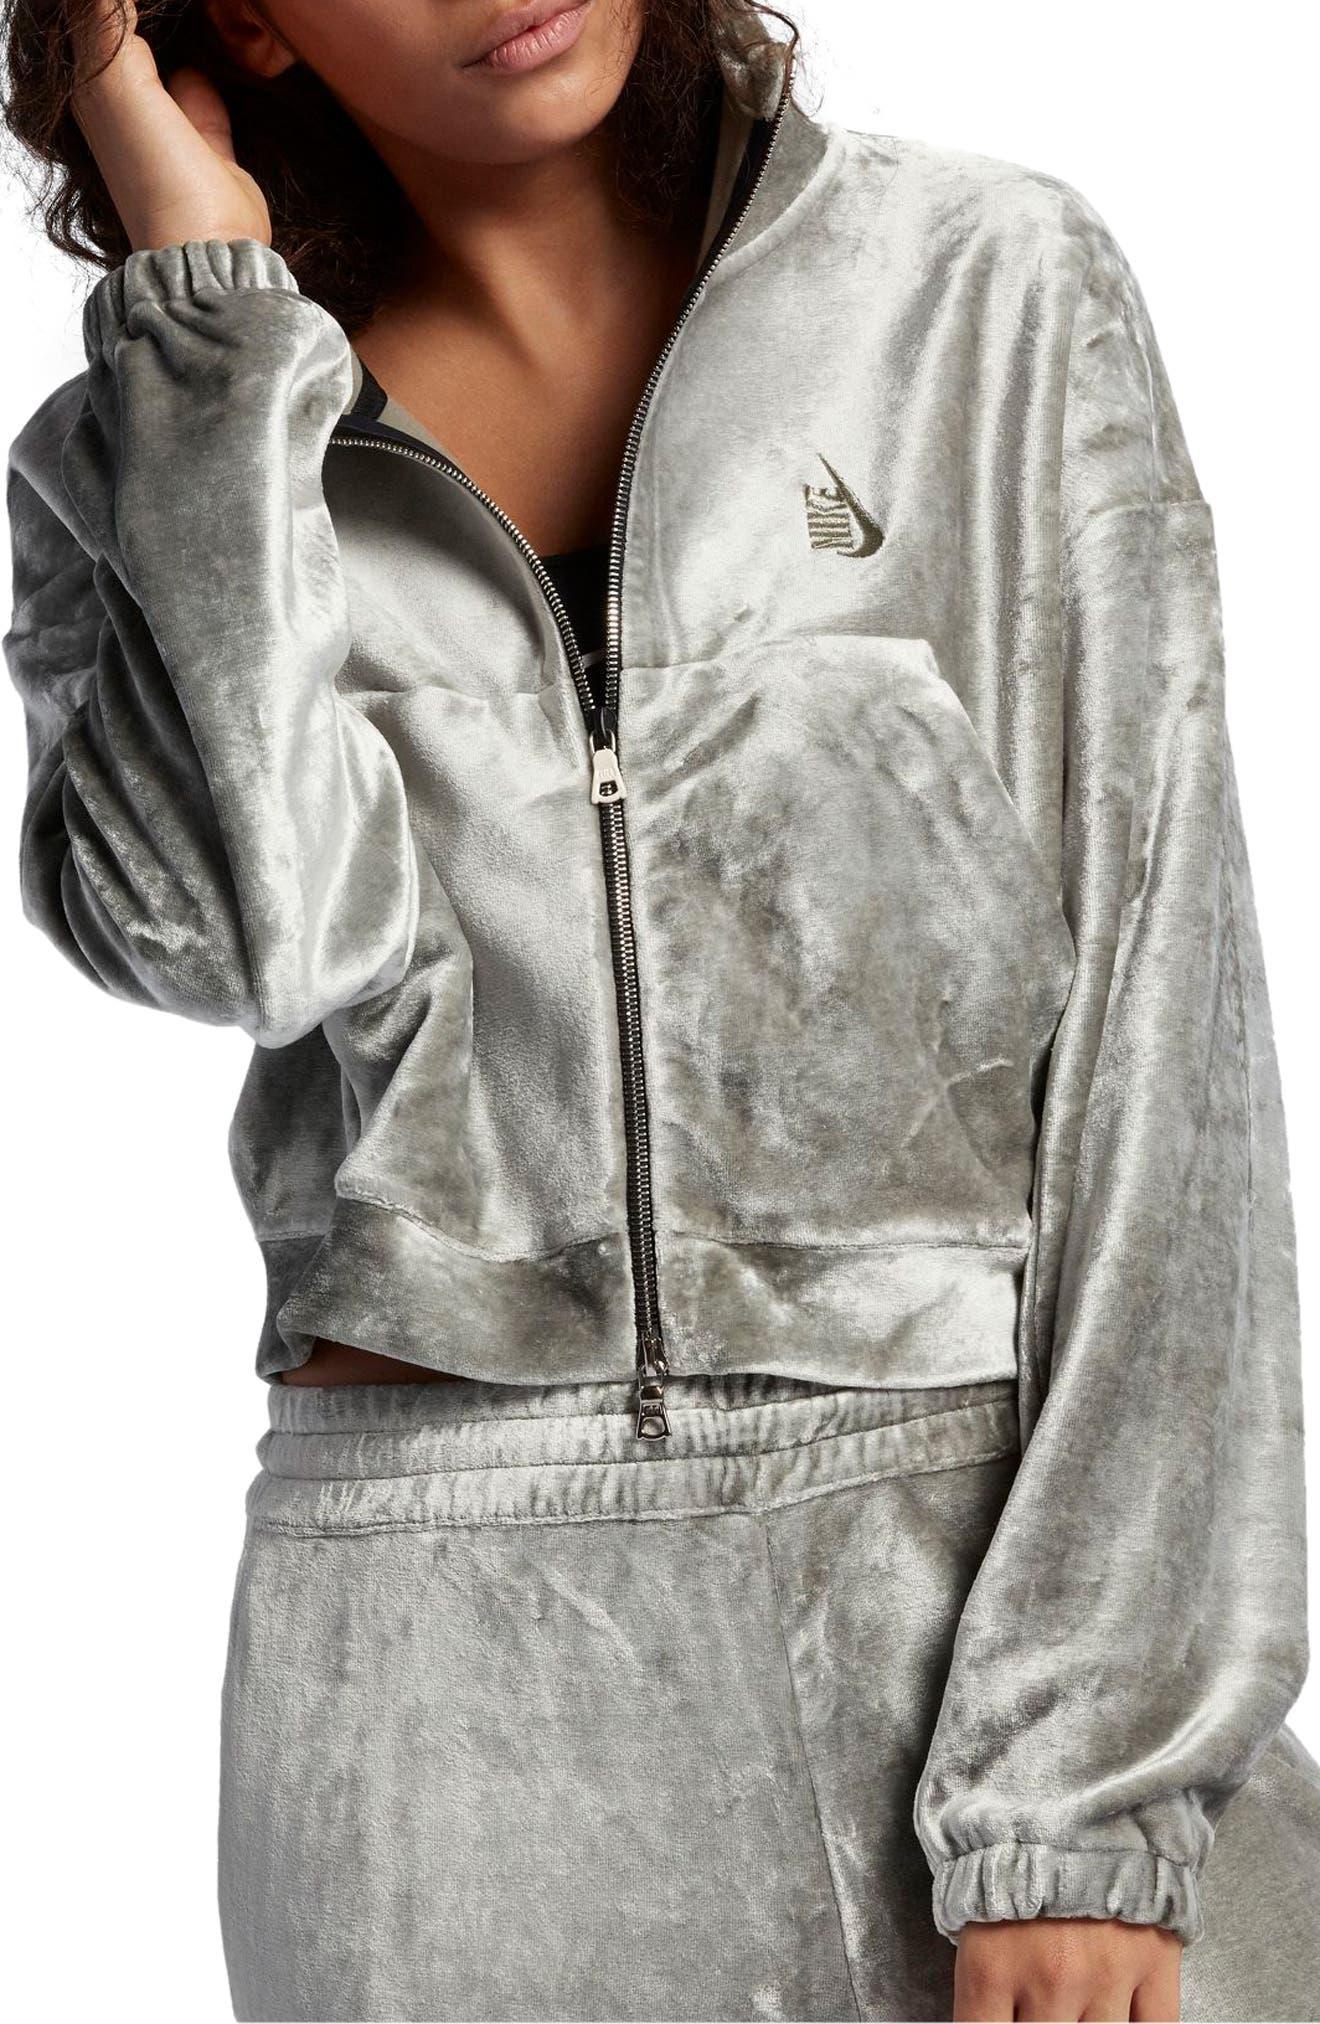 NikeLab Essentials Women's Velour Zip Hoodie,                             Main thumbnail 1, color,                             024